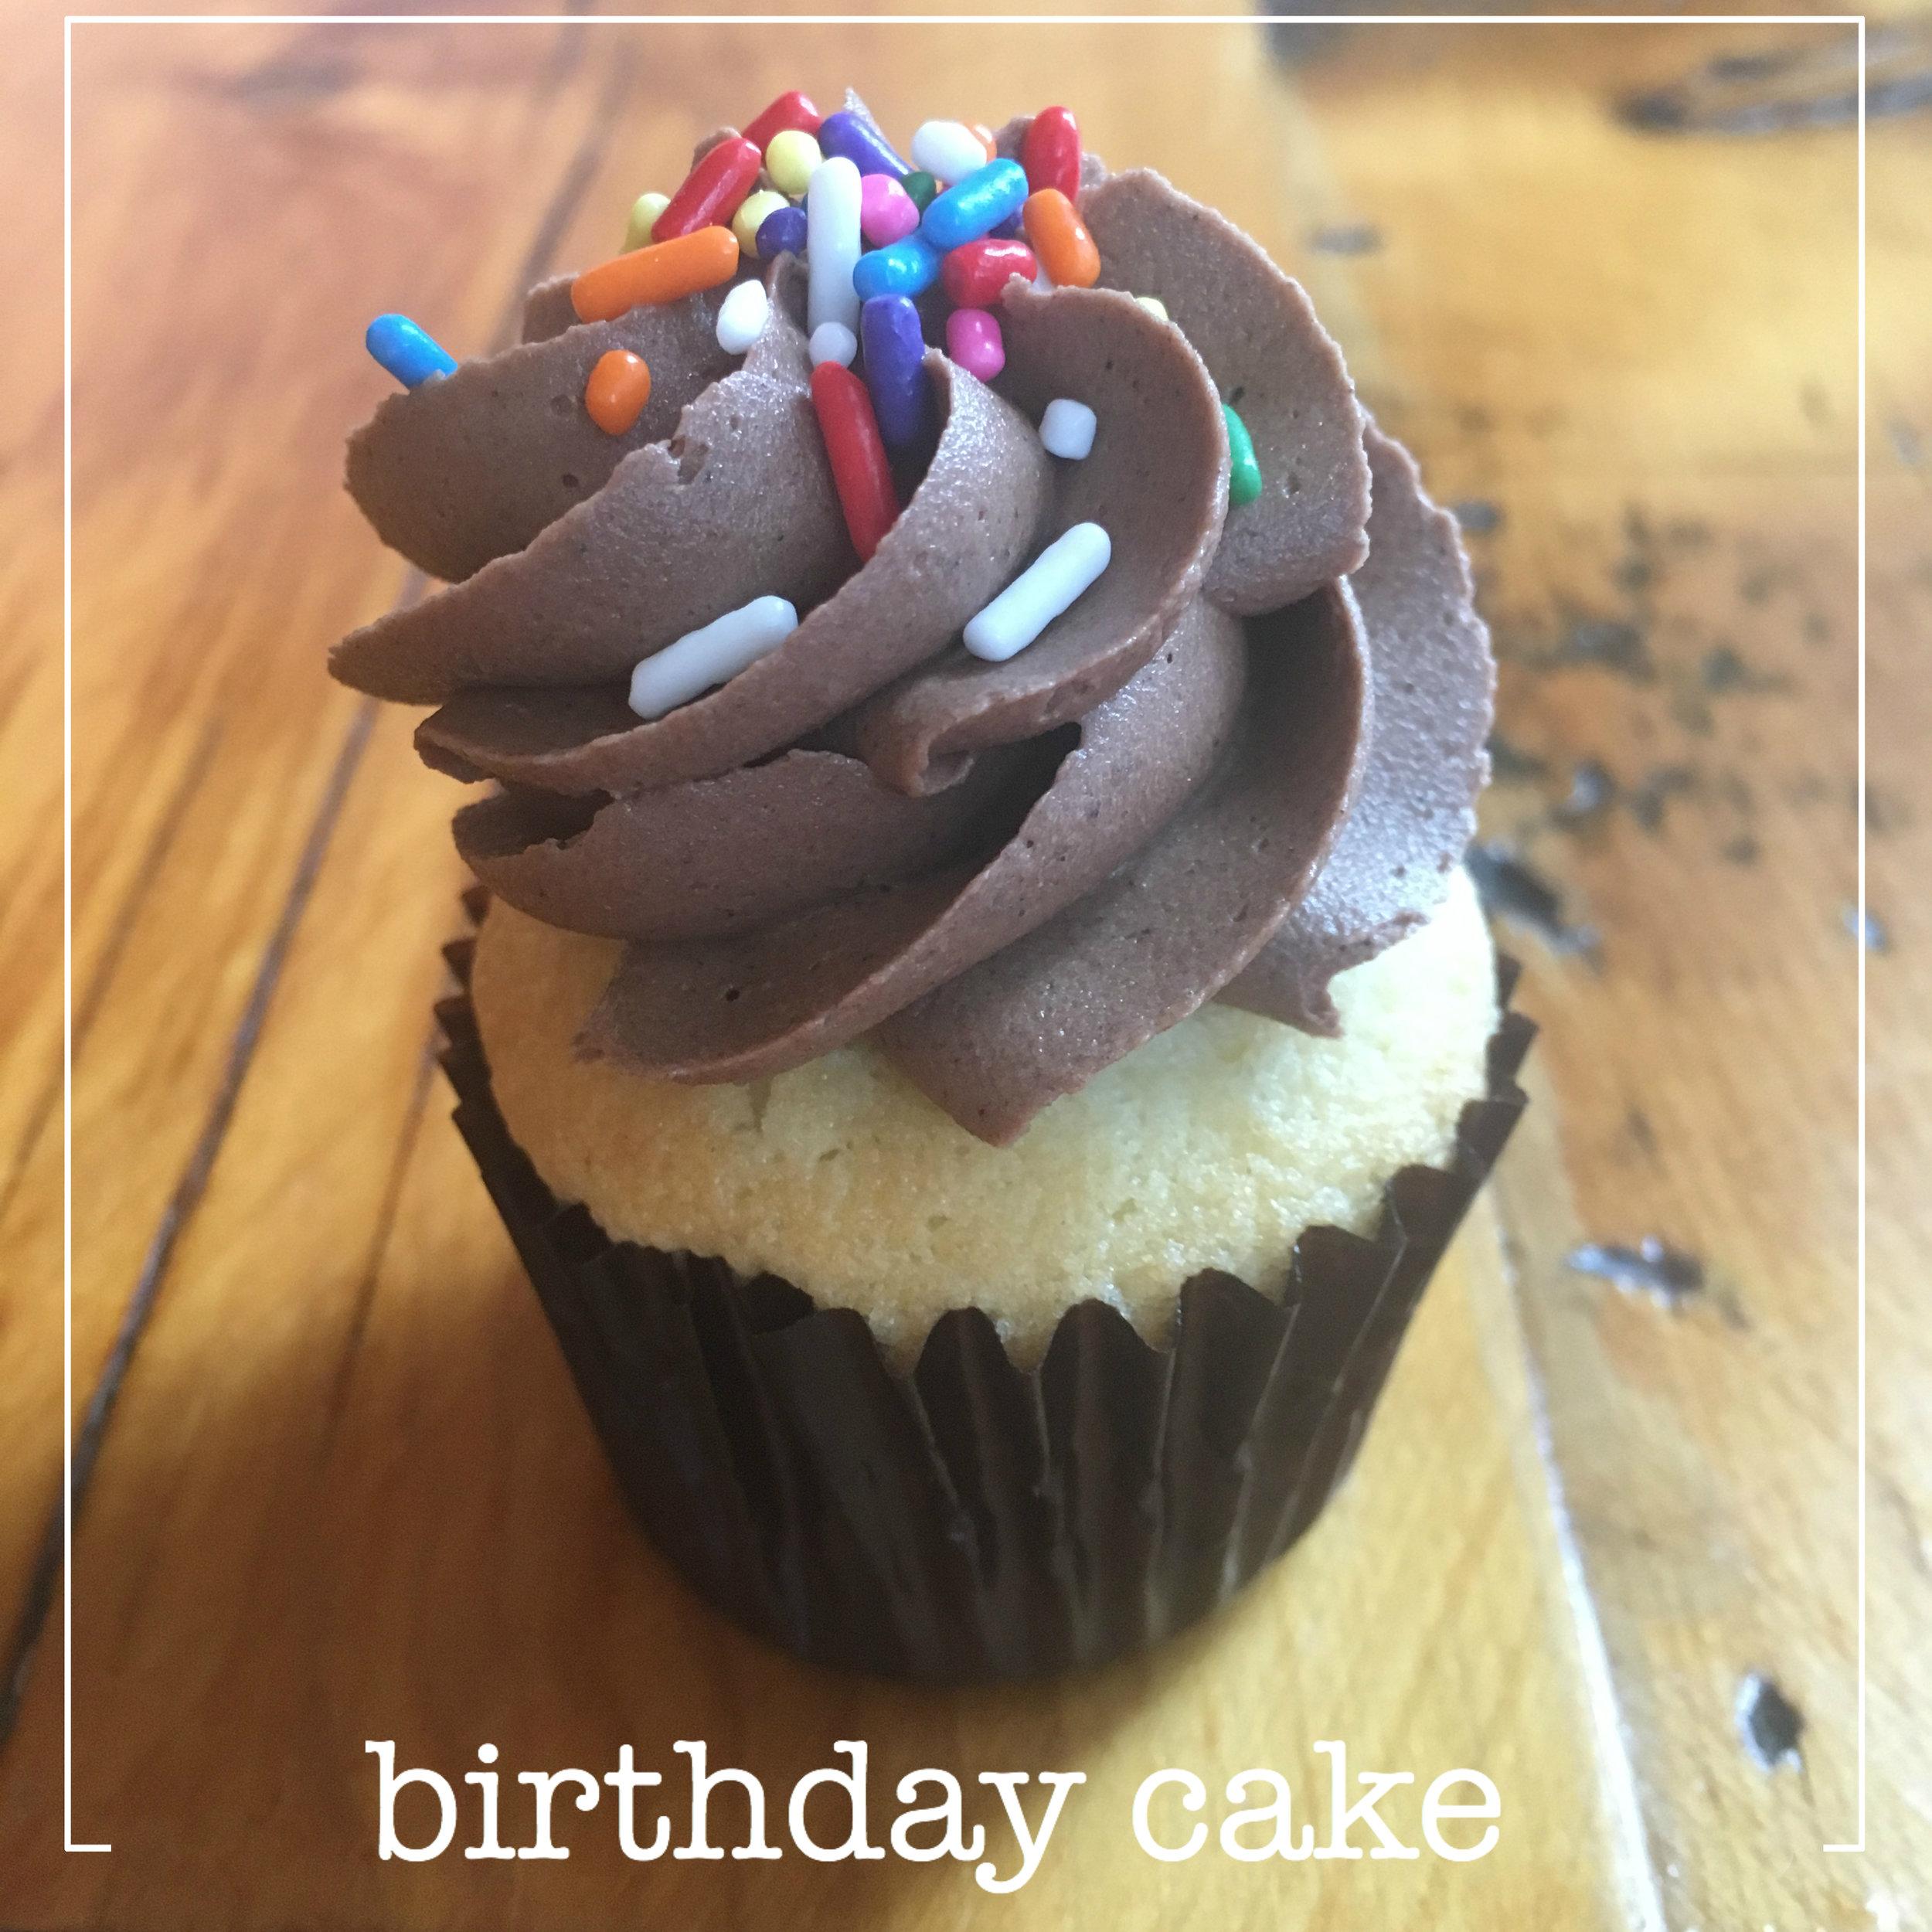 Birthday Cake.jpg